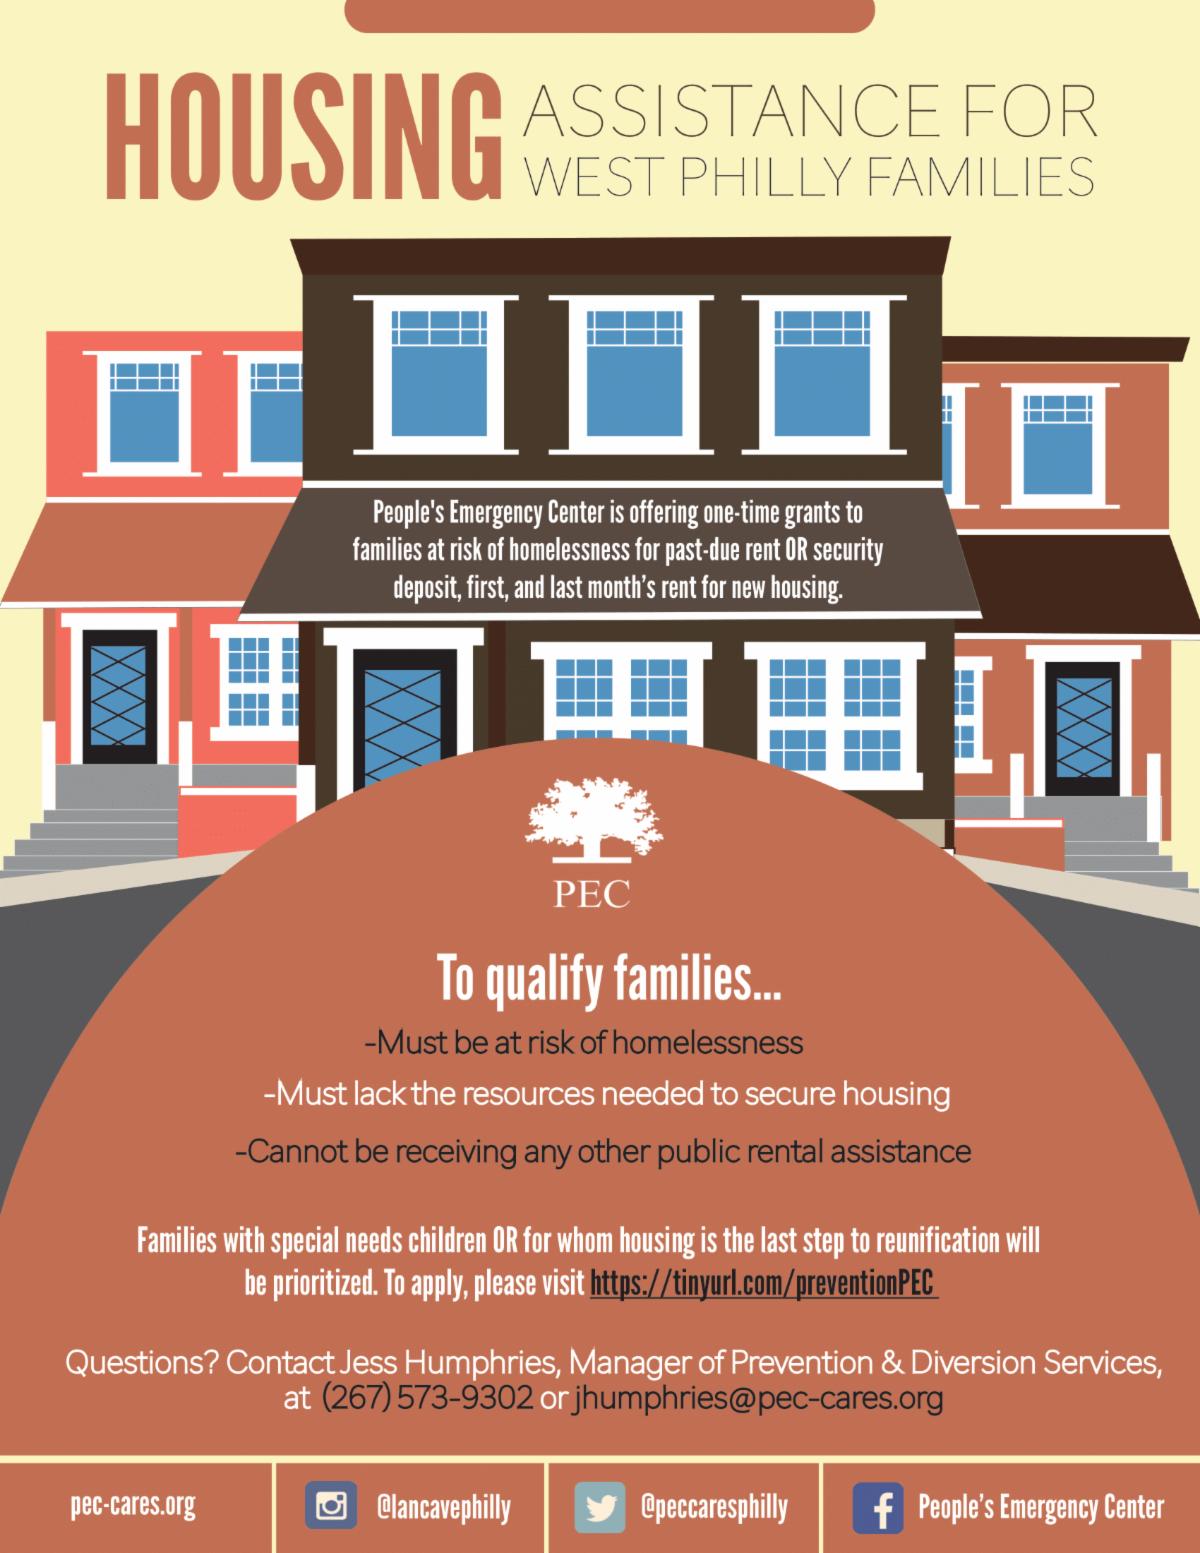 houses, homeless assistance program, brown, orange